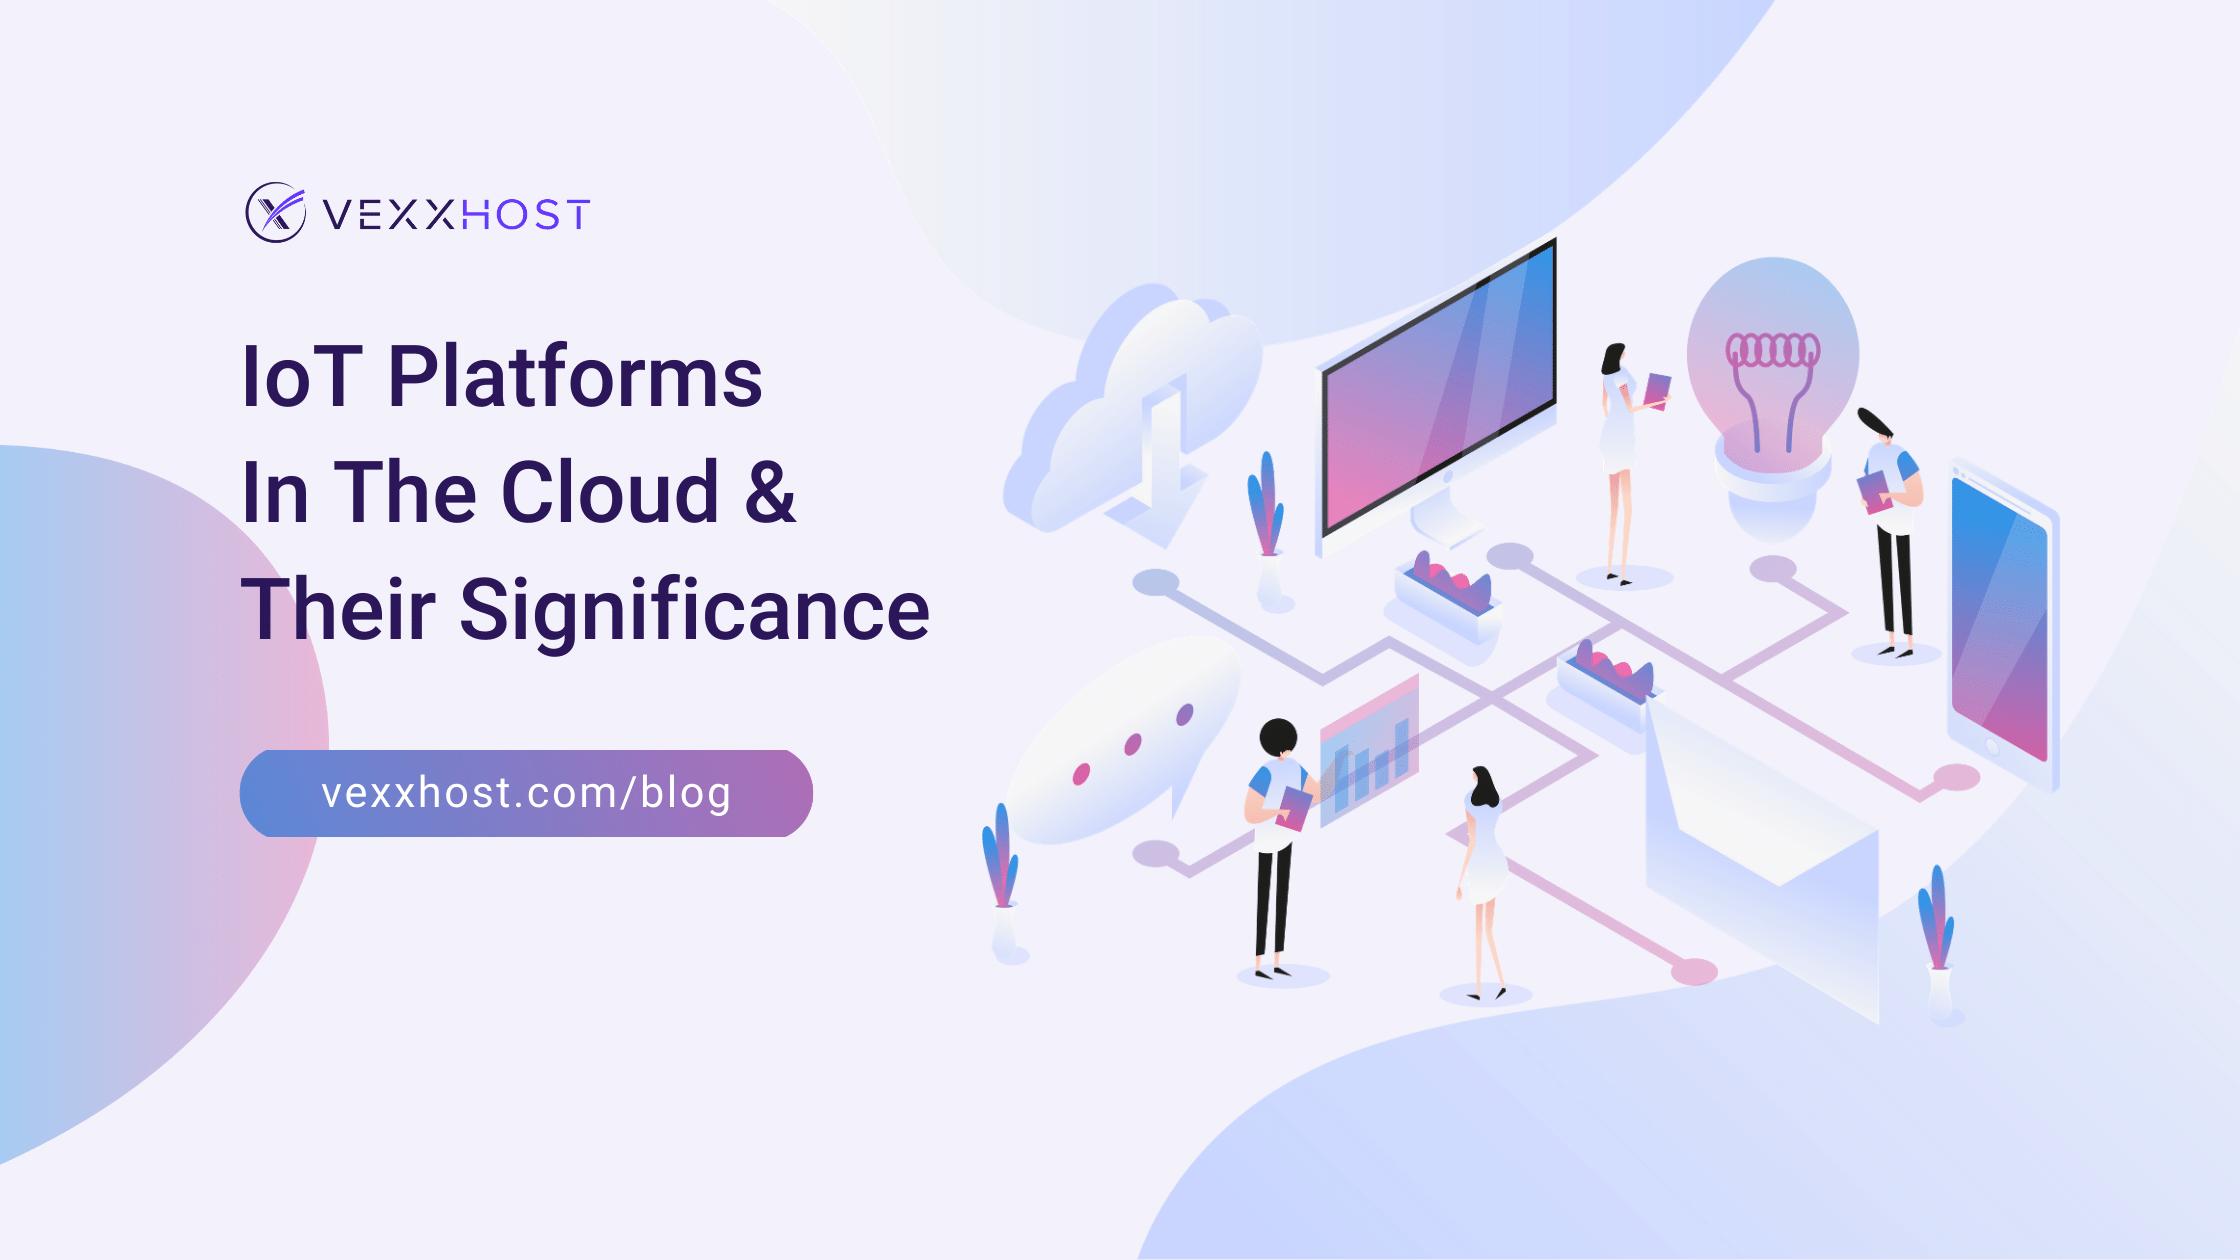 iot-platforms-in-the-cloud-vexxhost-blog-illustration